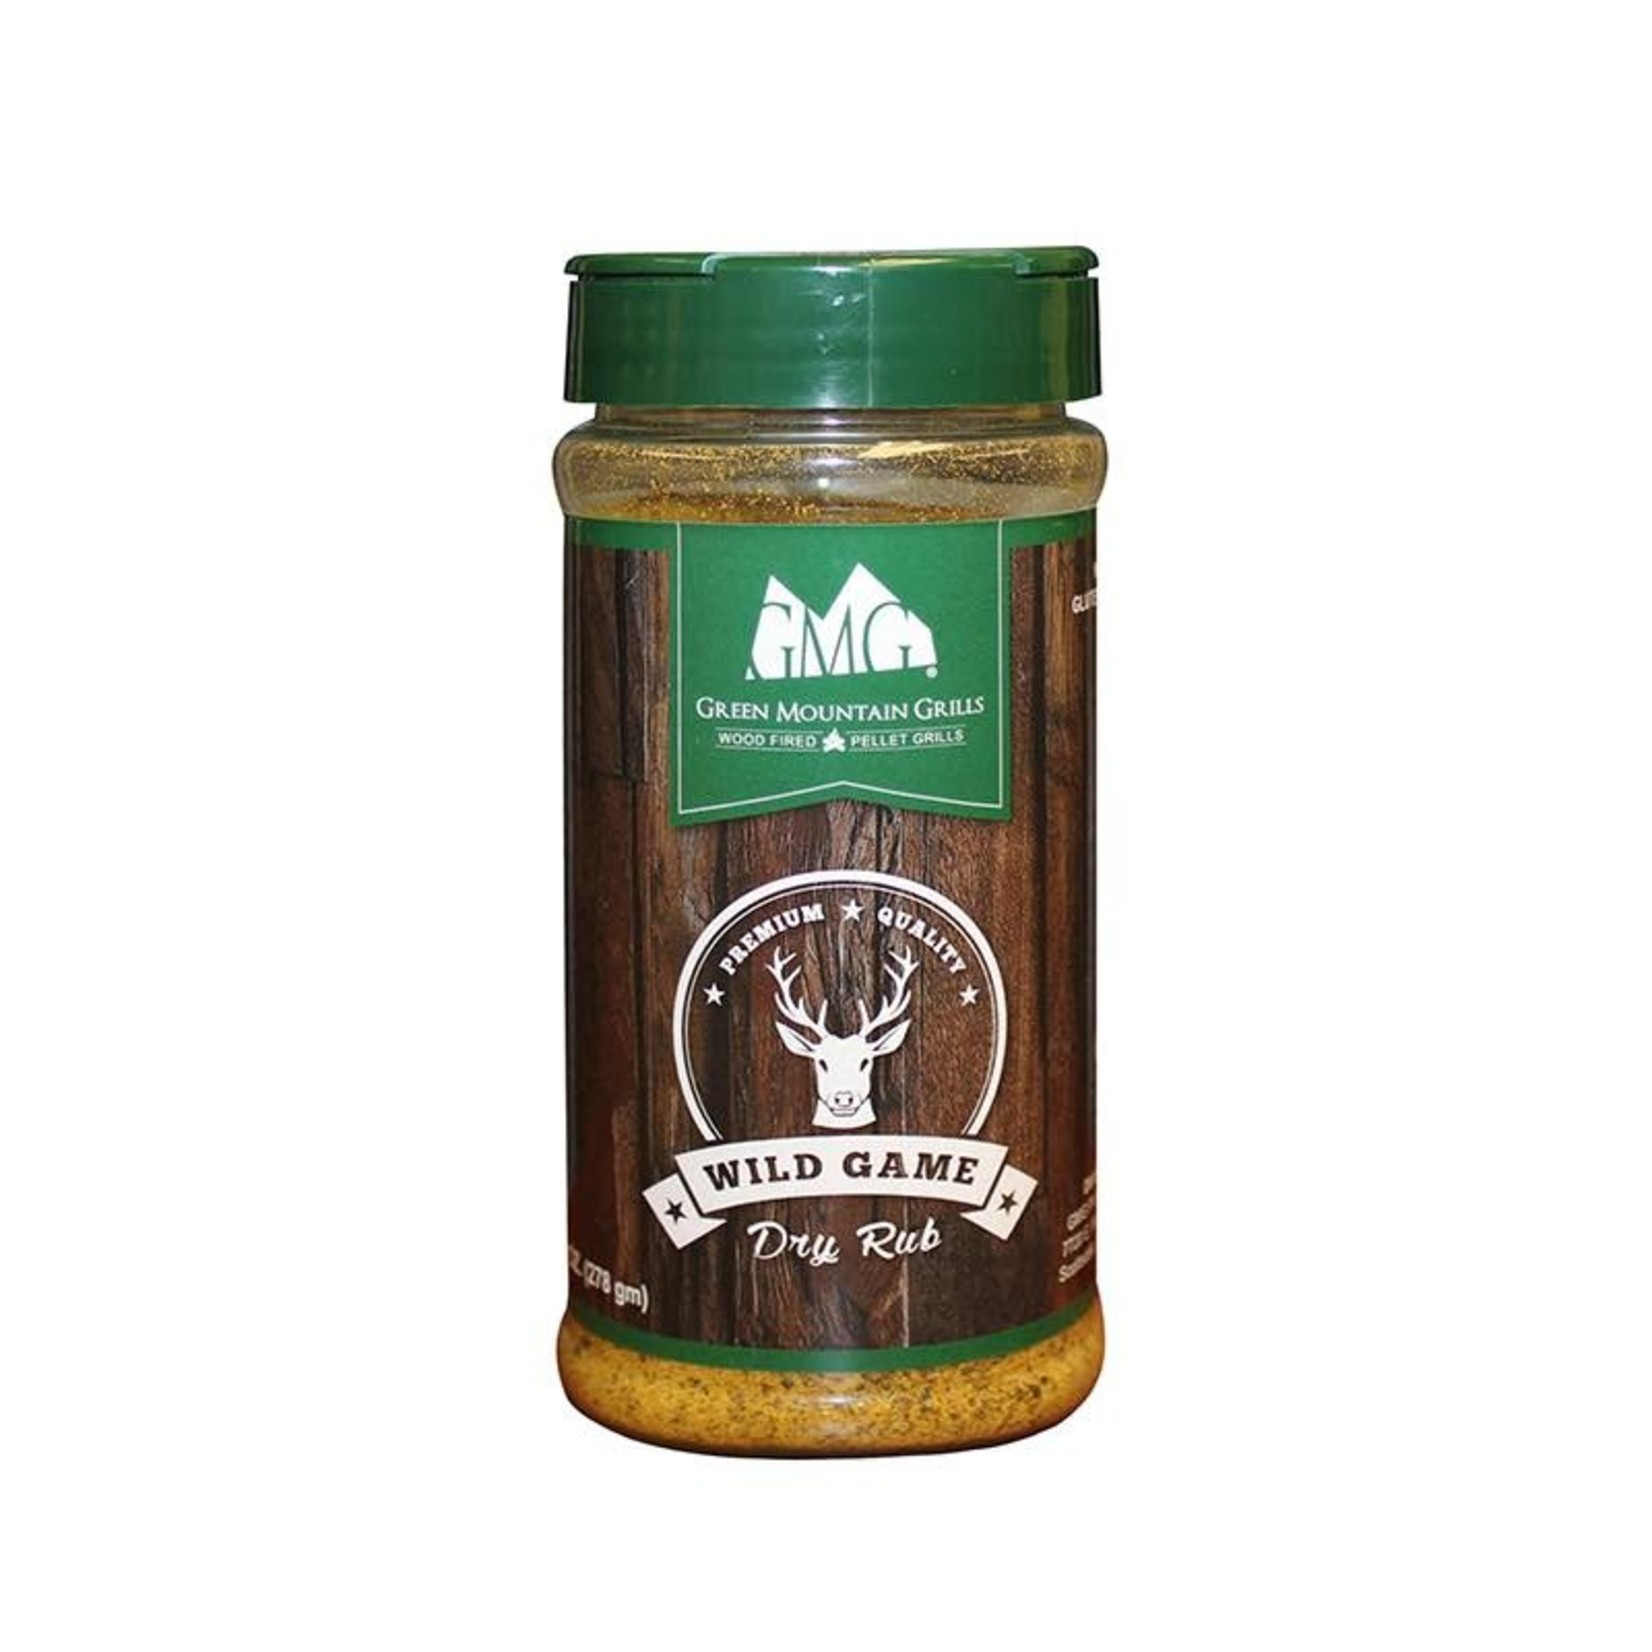 Green Mountain Grill GMG Wild Game rub